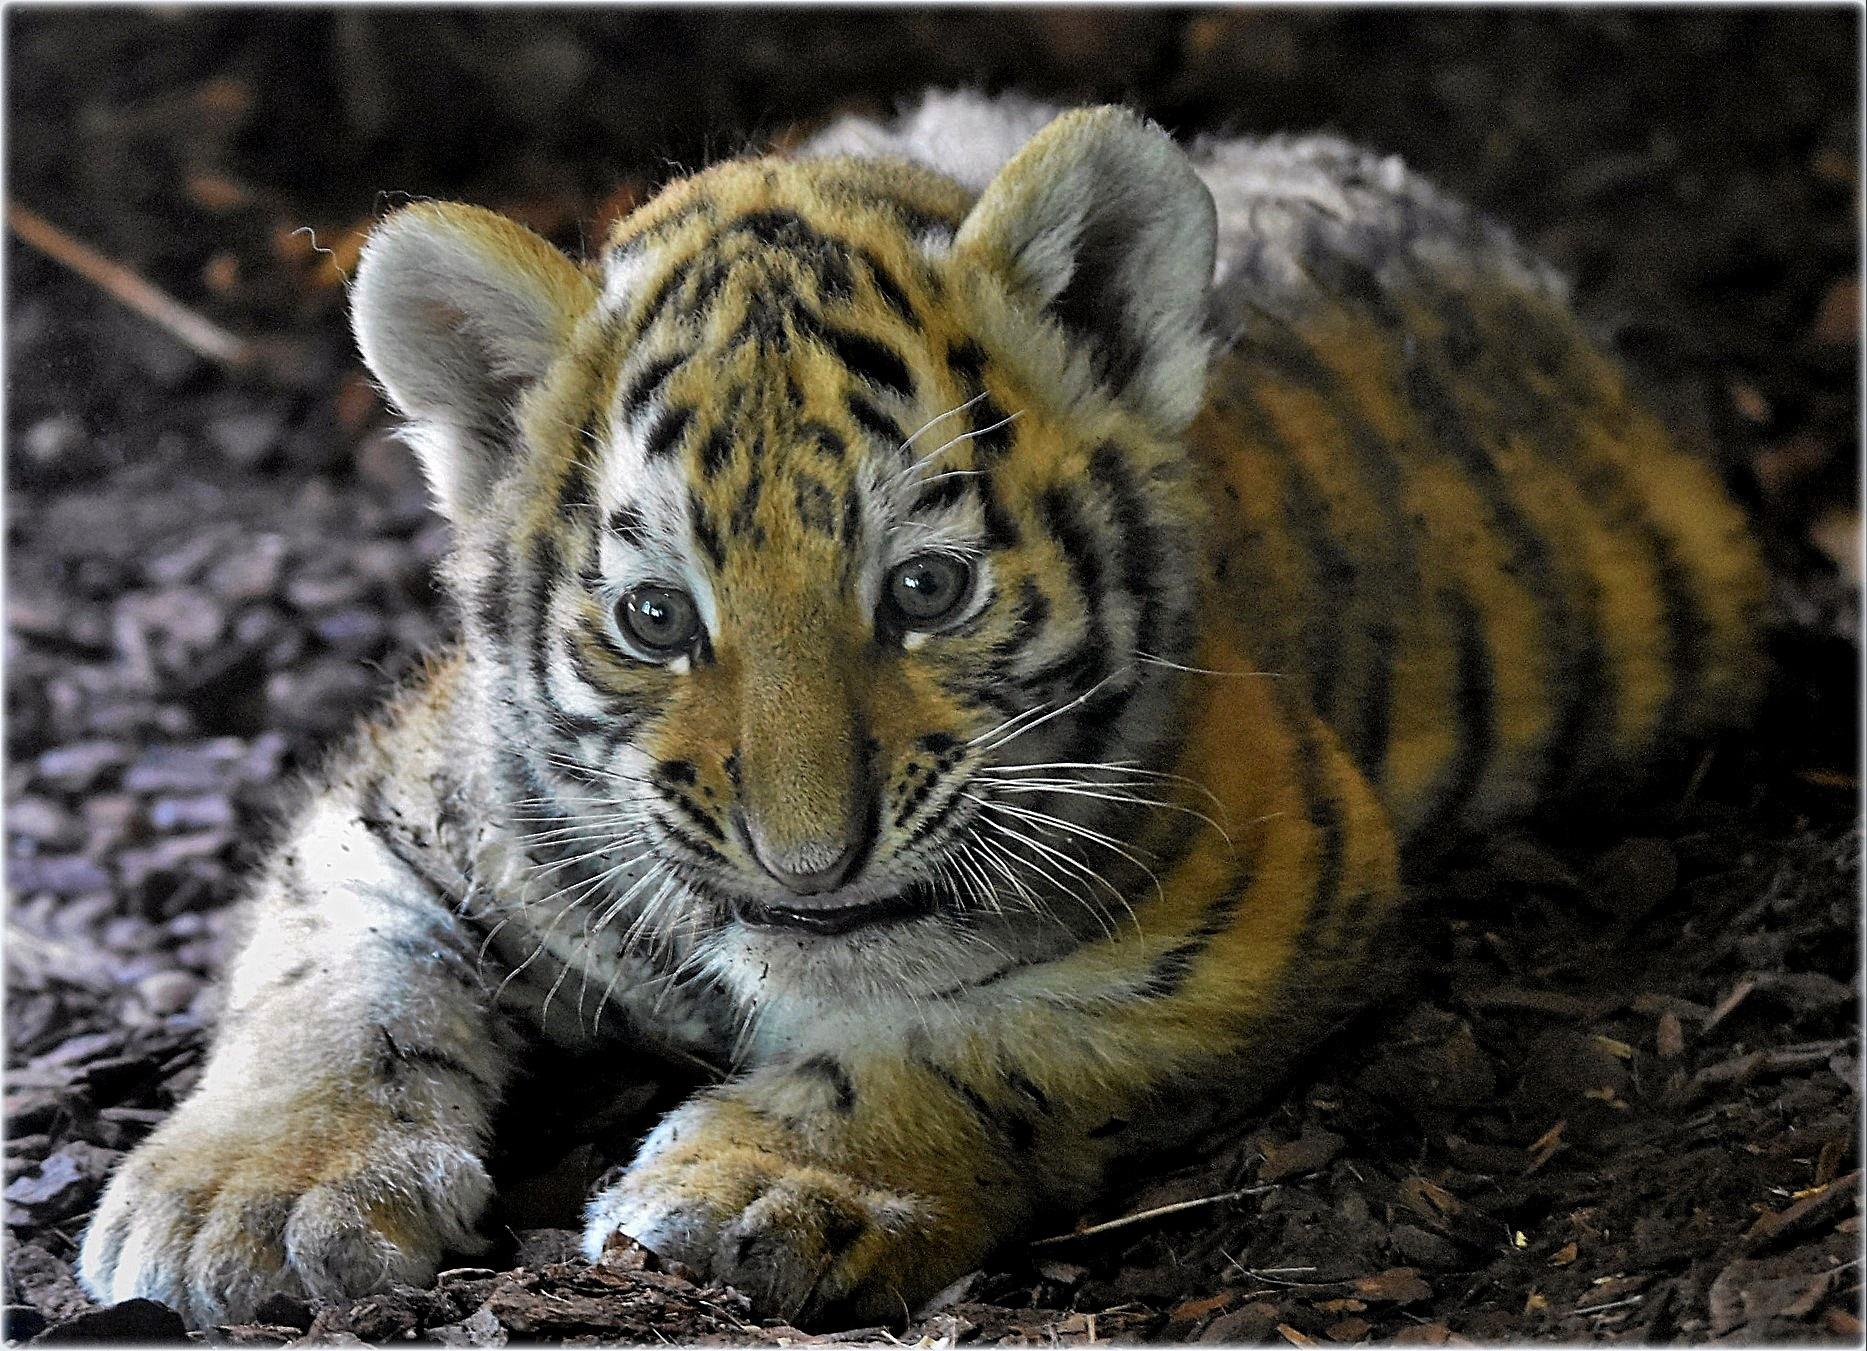 """tiger-baby"" by BauerStefan"